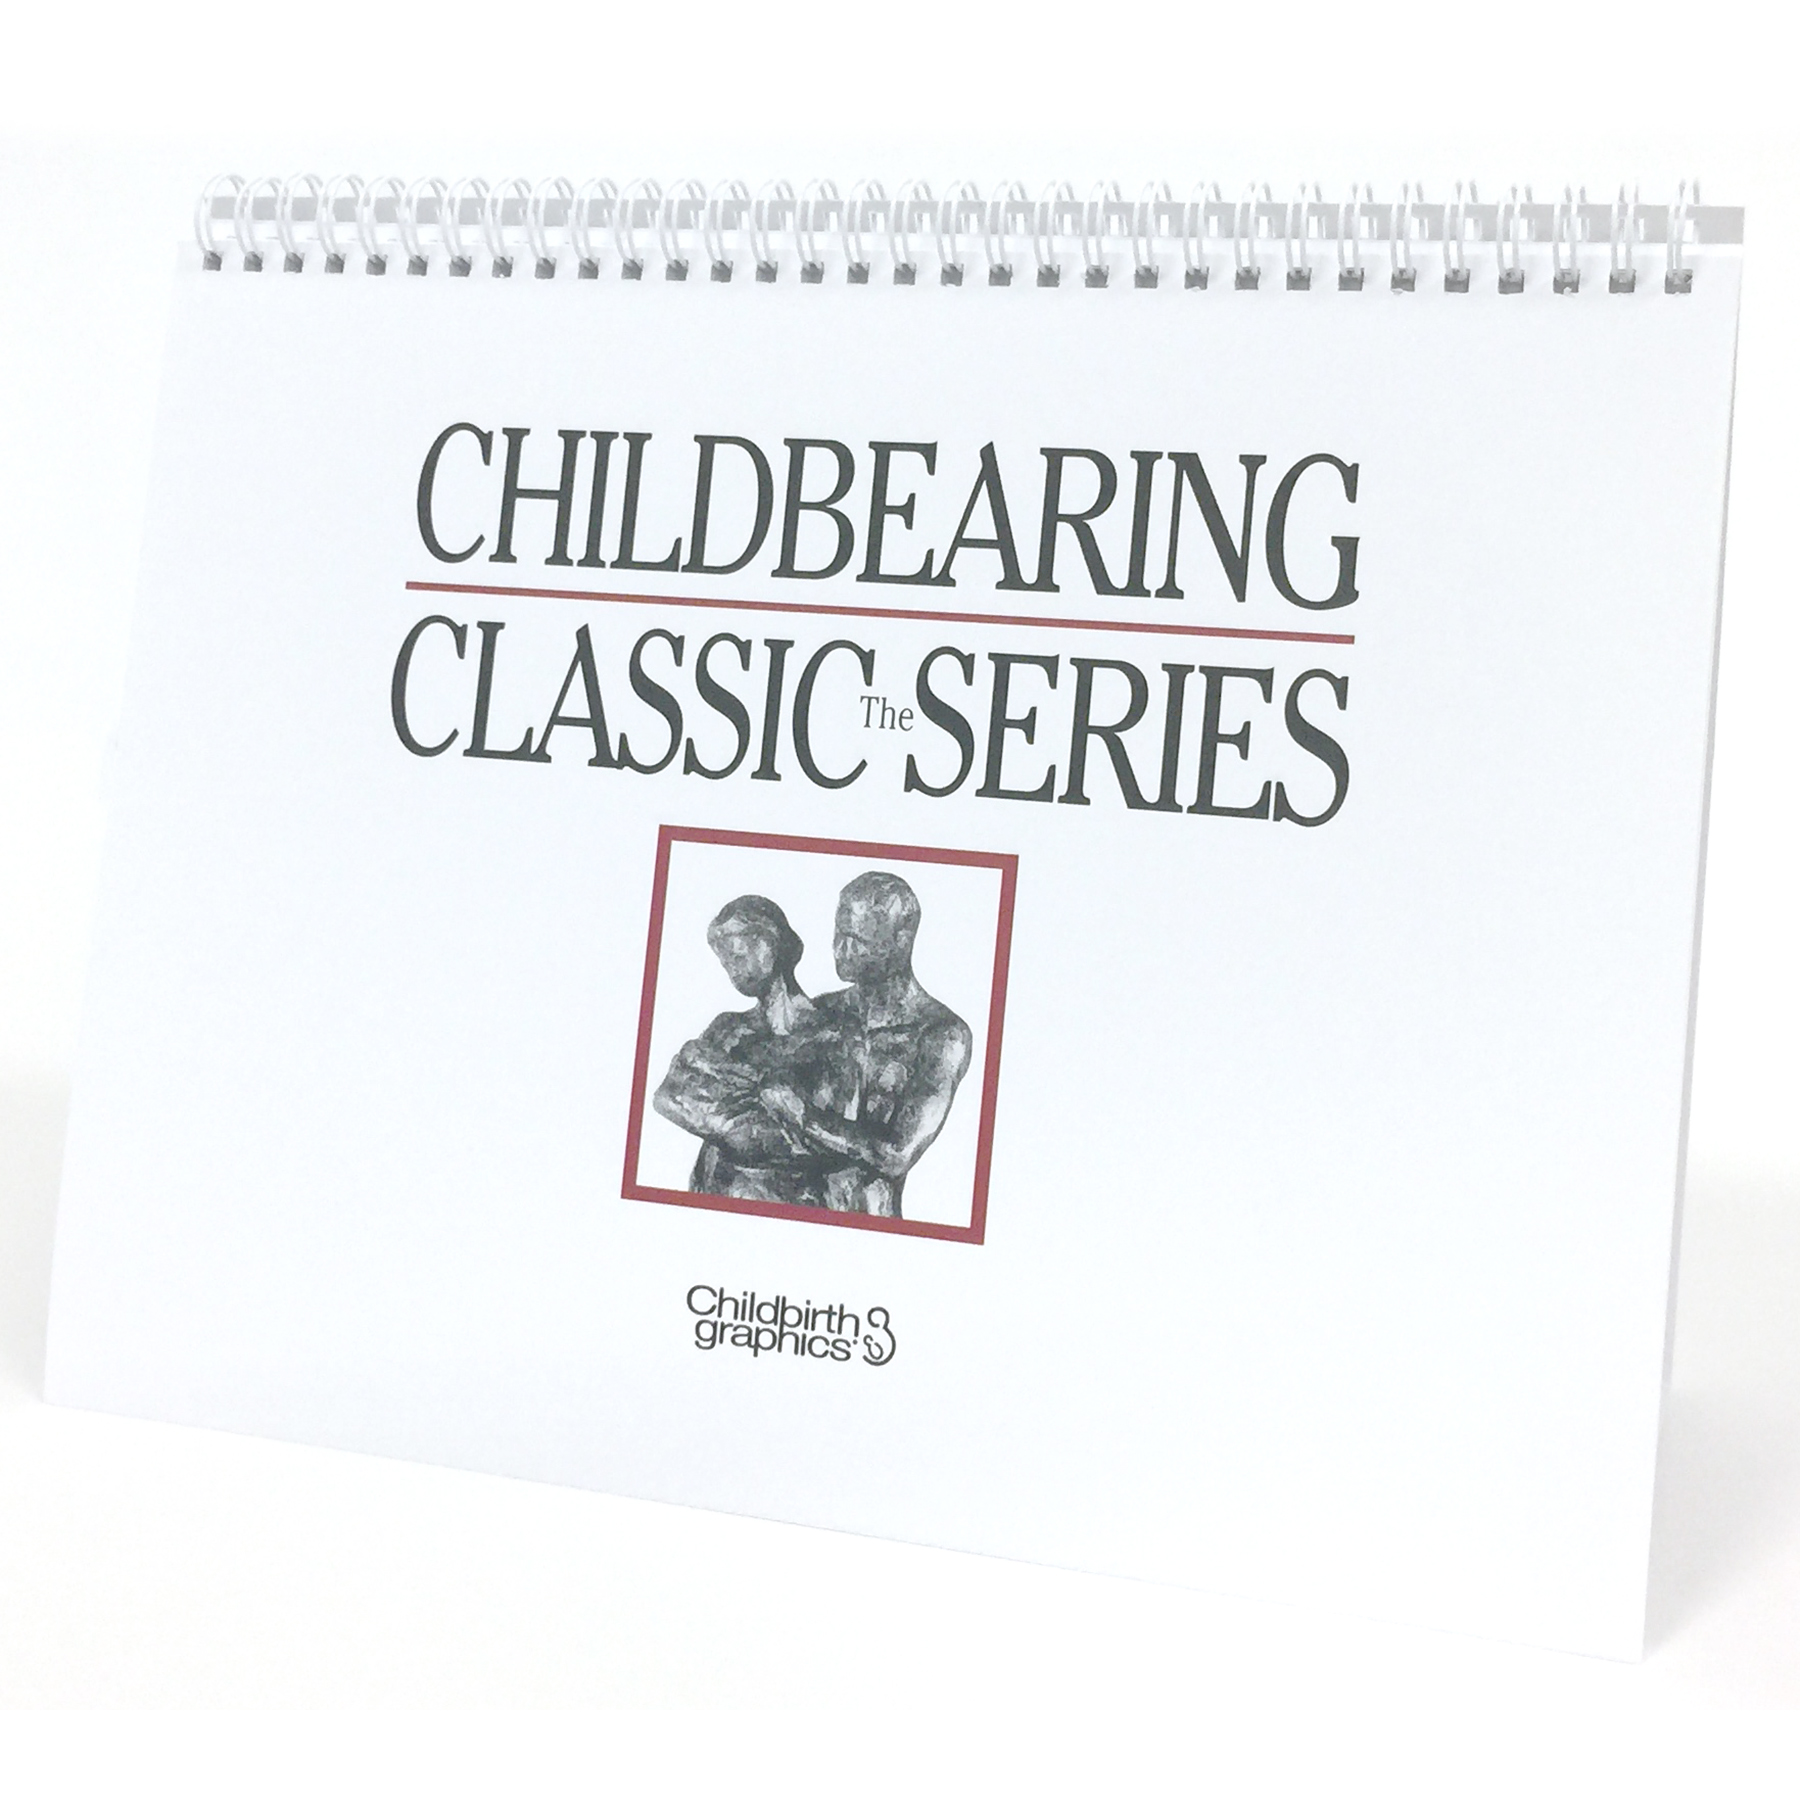 Childbearing illustrated desk size spiral bound flip chart cover, Childbirth Graphics, 50702